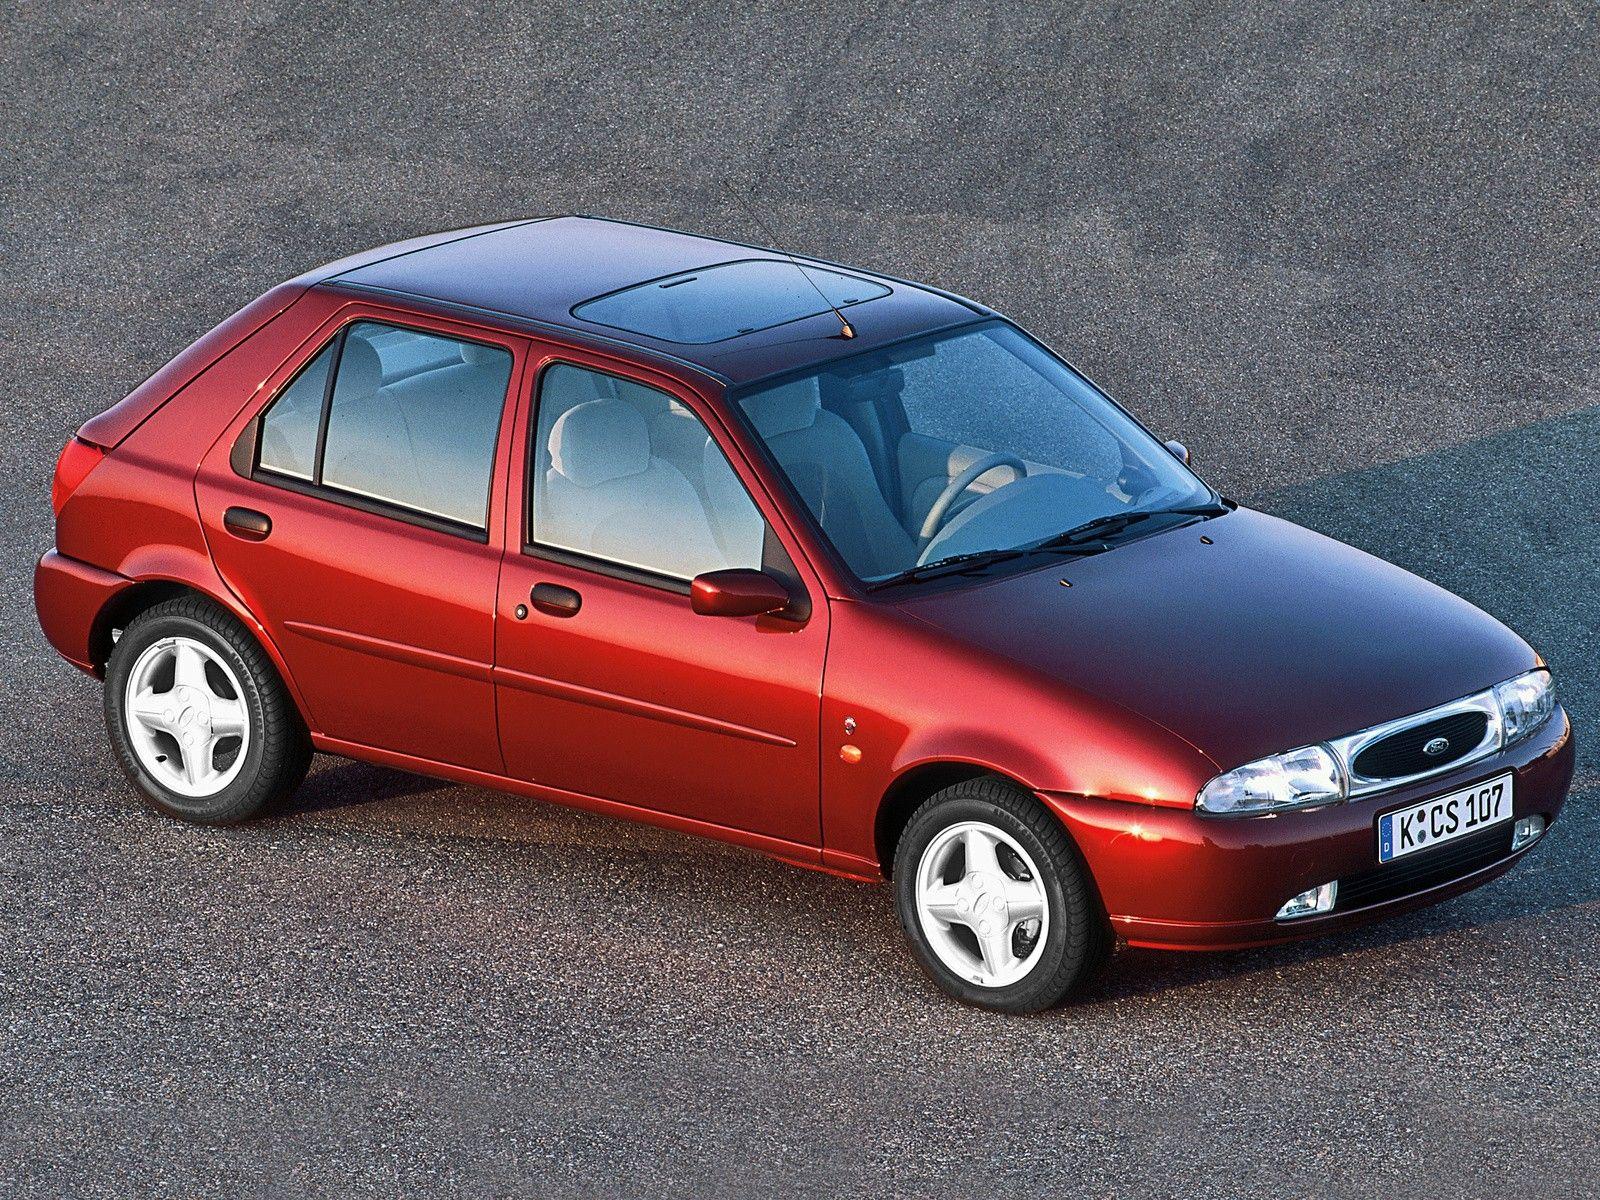 Ford Fiesta Ghia 5 Door Worldwide 1995 99 In 2020 Ford Fiesta Ford Ford Motor